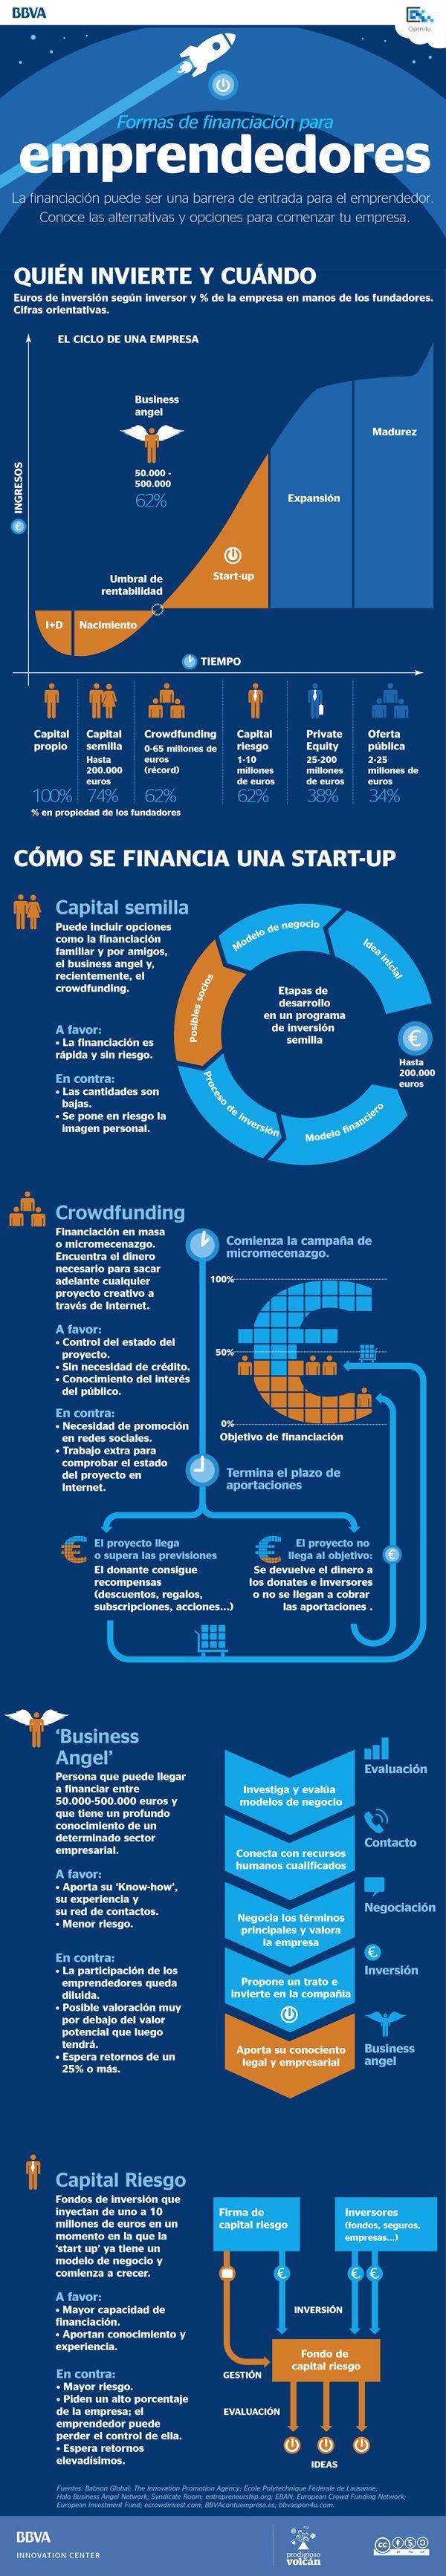 Fuentes de financiación para emprendedores